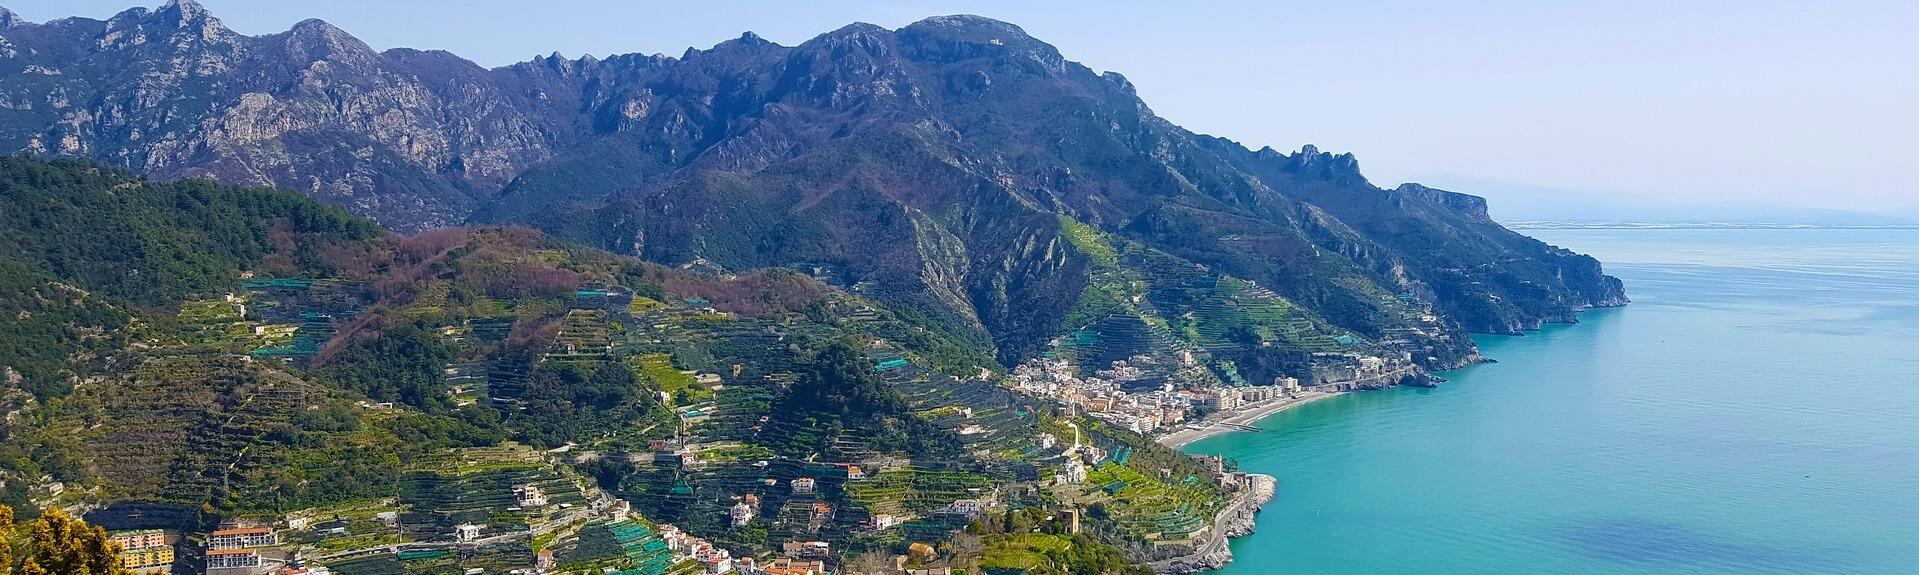 Amalfi Coast Tour from Sorrento